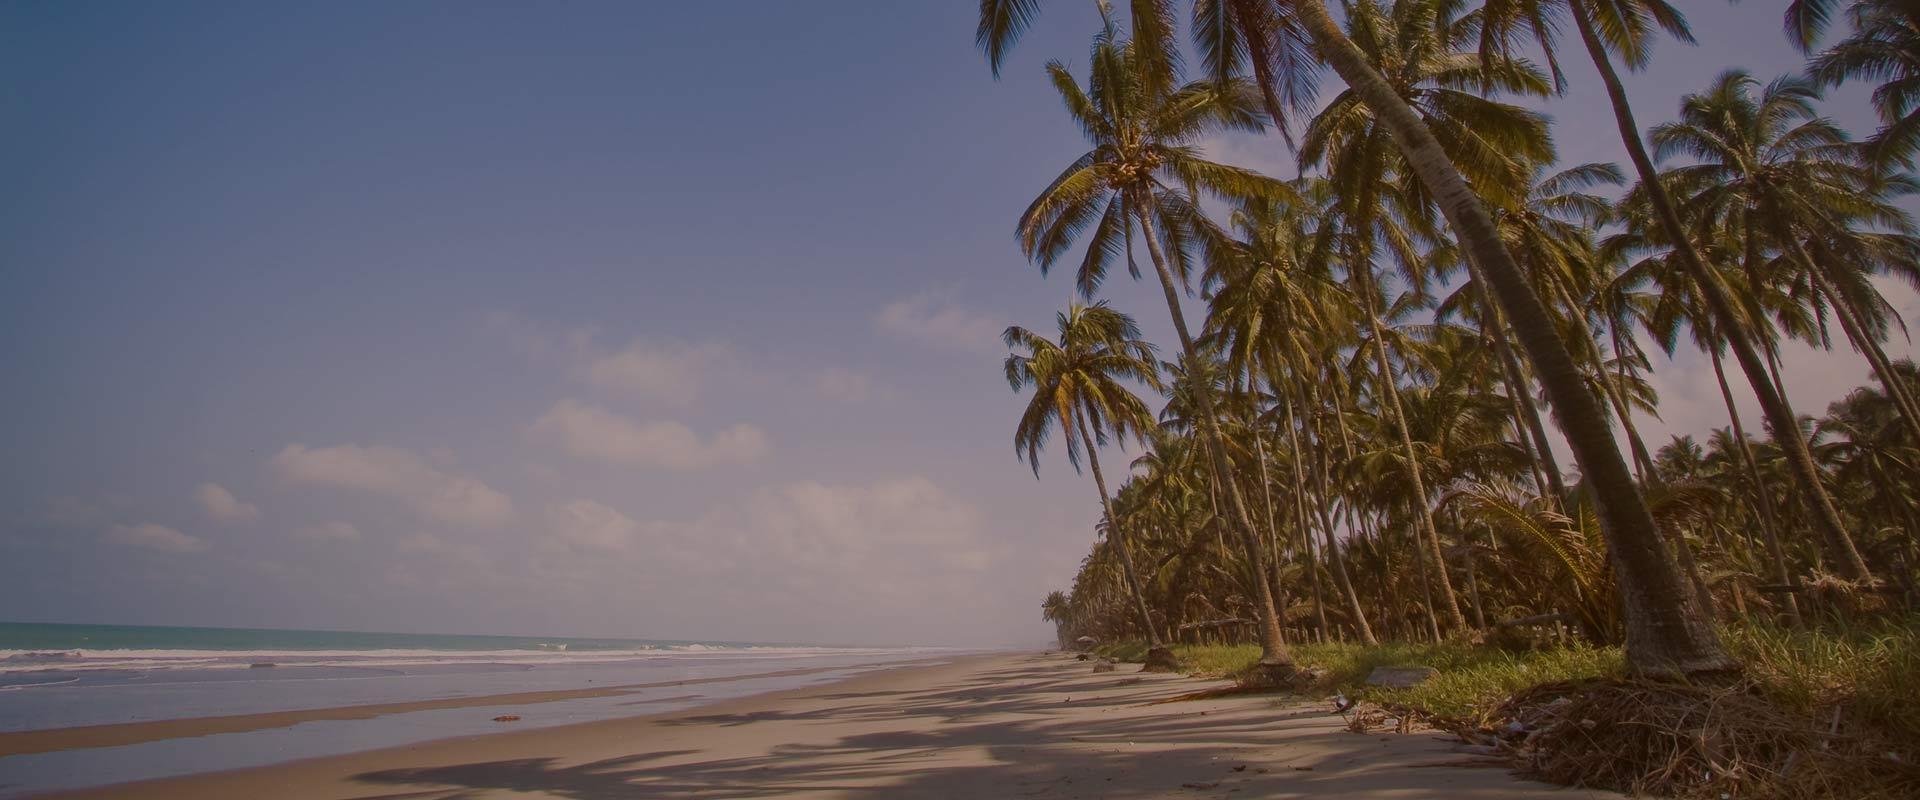 Cojimies ecuadorian beach paralax panoramic